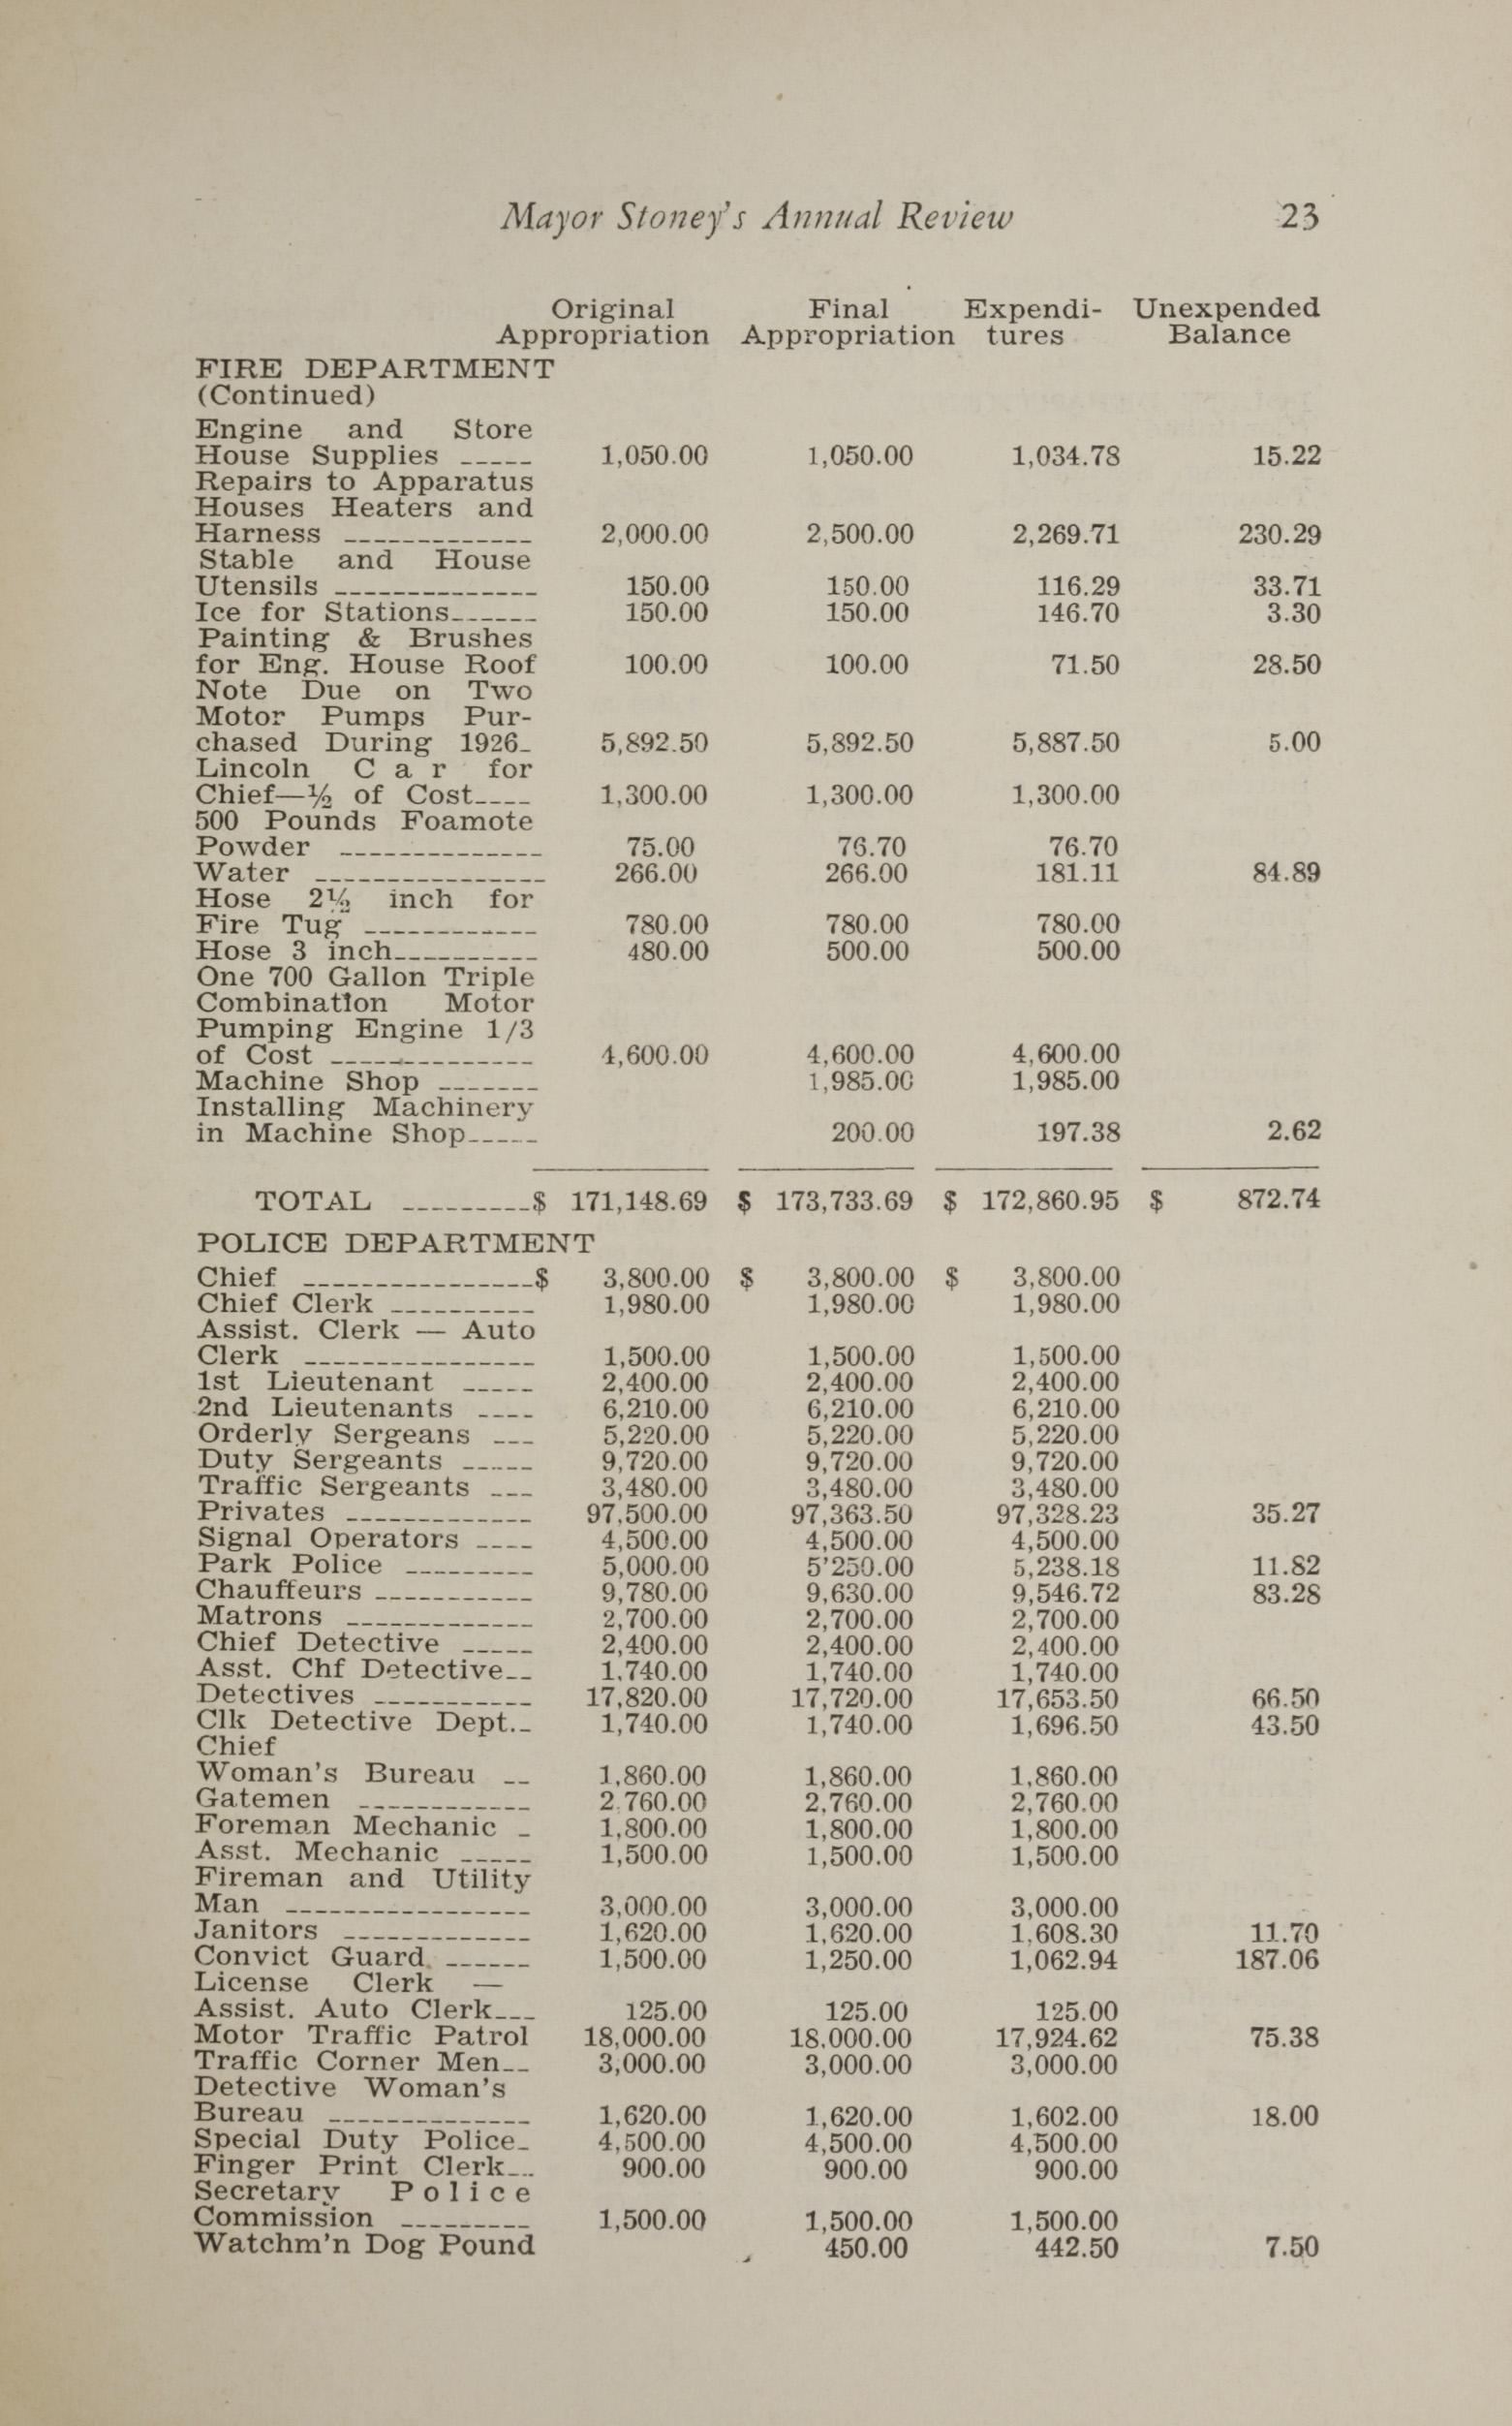 Charleston Yearbook, 1930, page 23